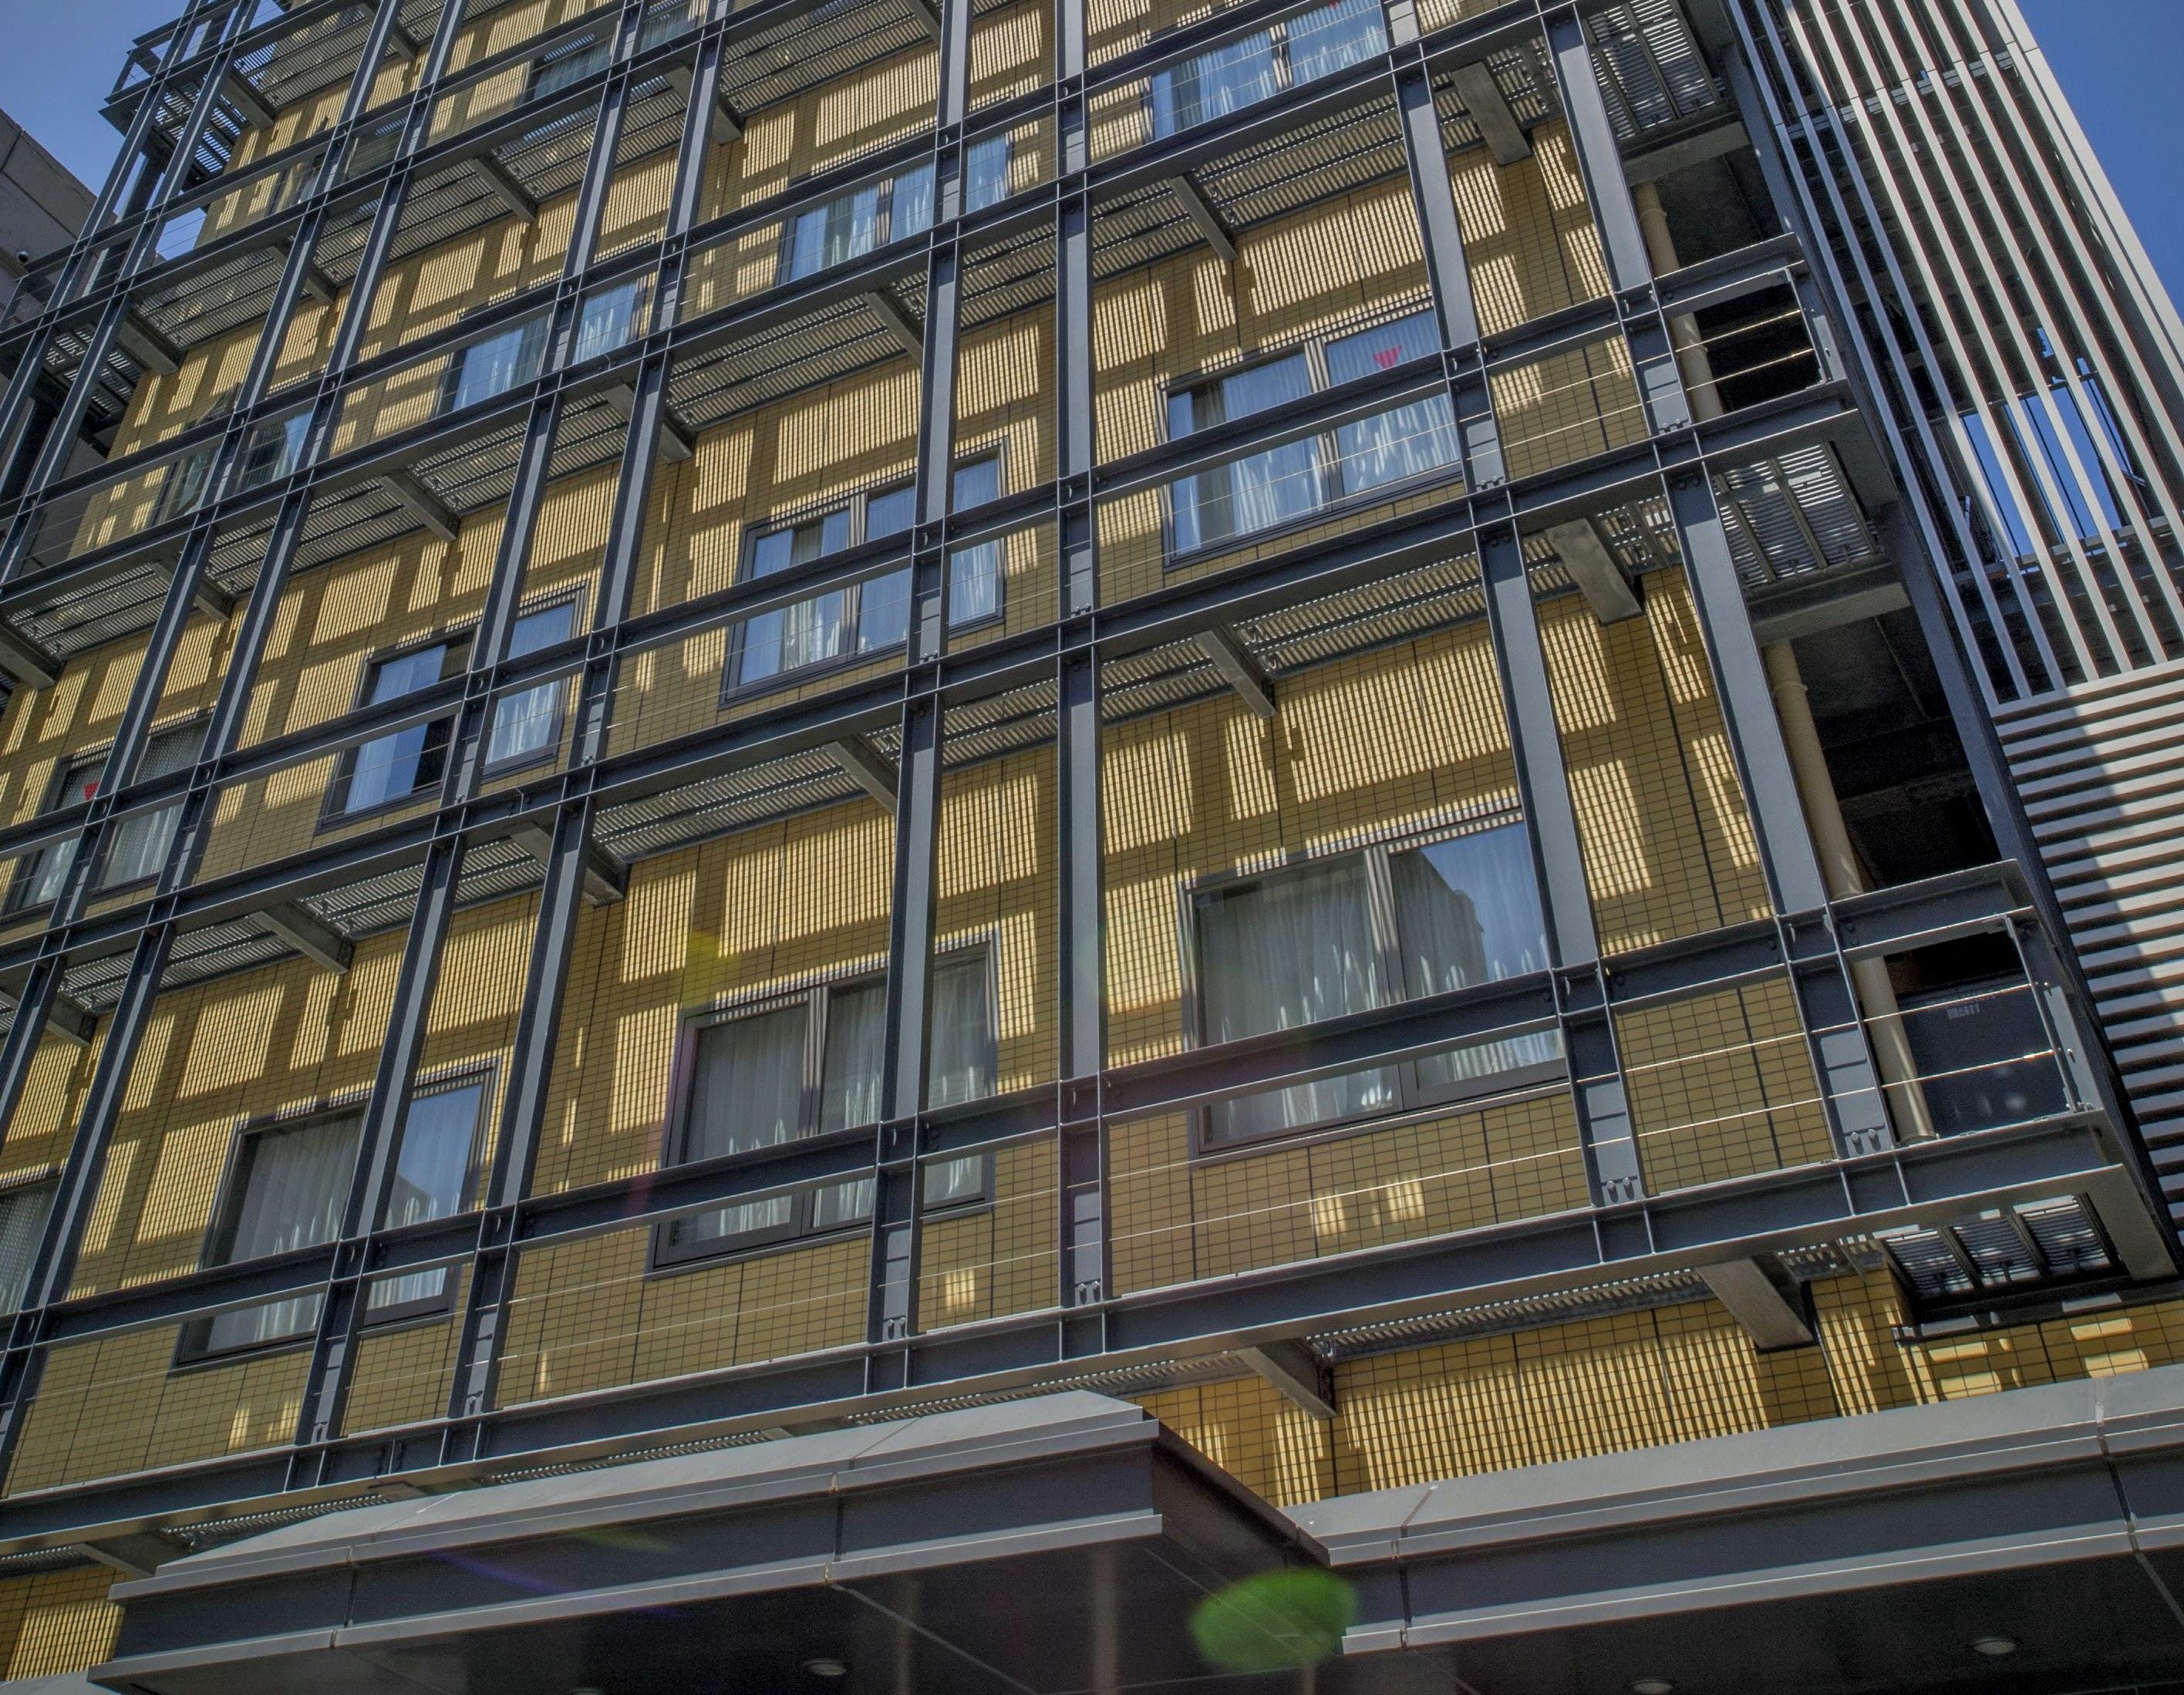 Ihg To Bring Holiday Inn Brand To Osaka This Year Hotel